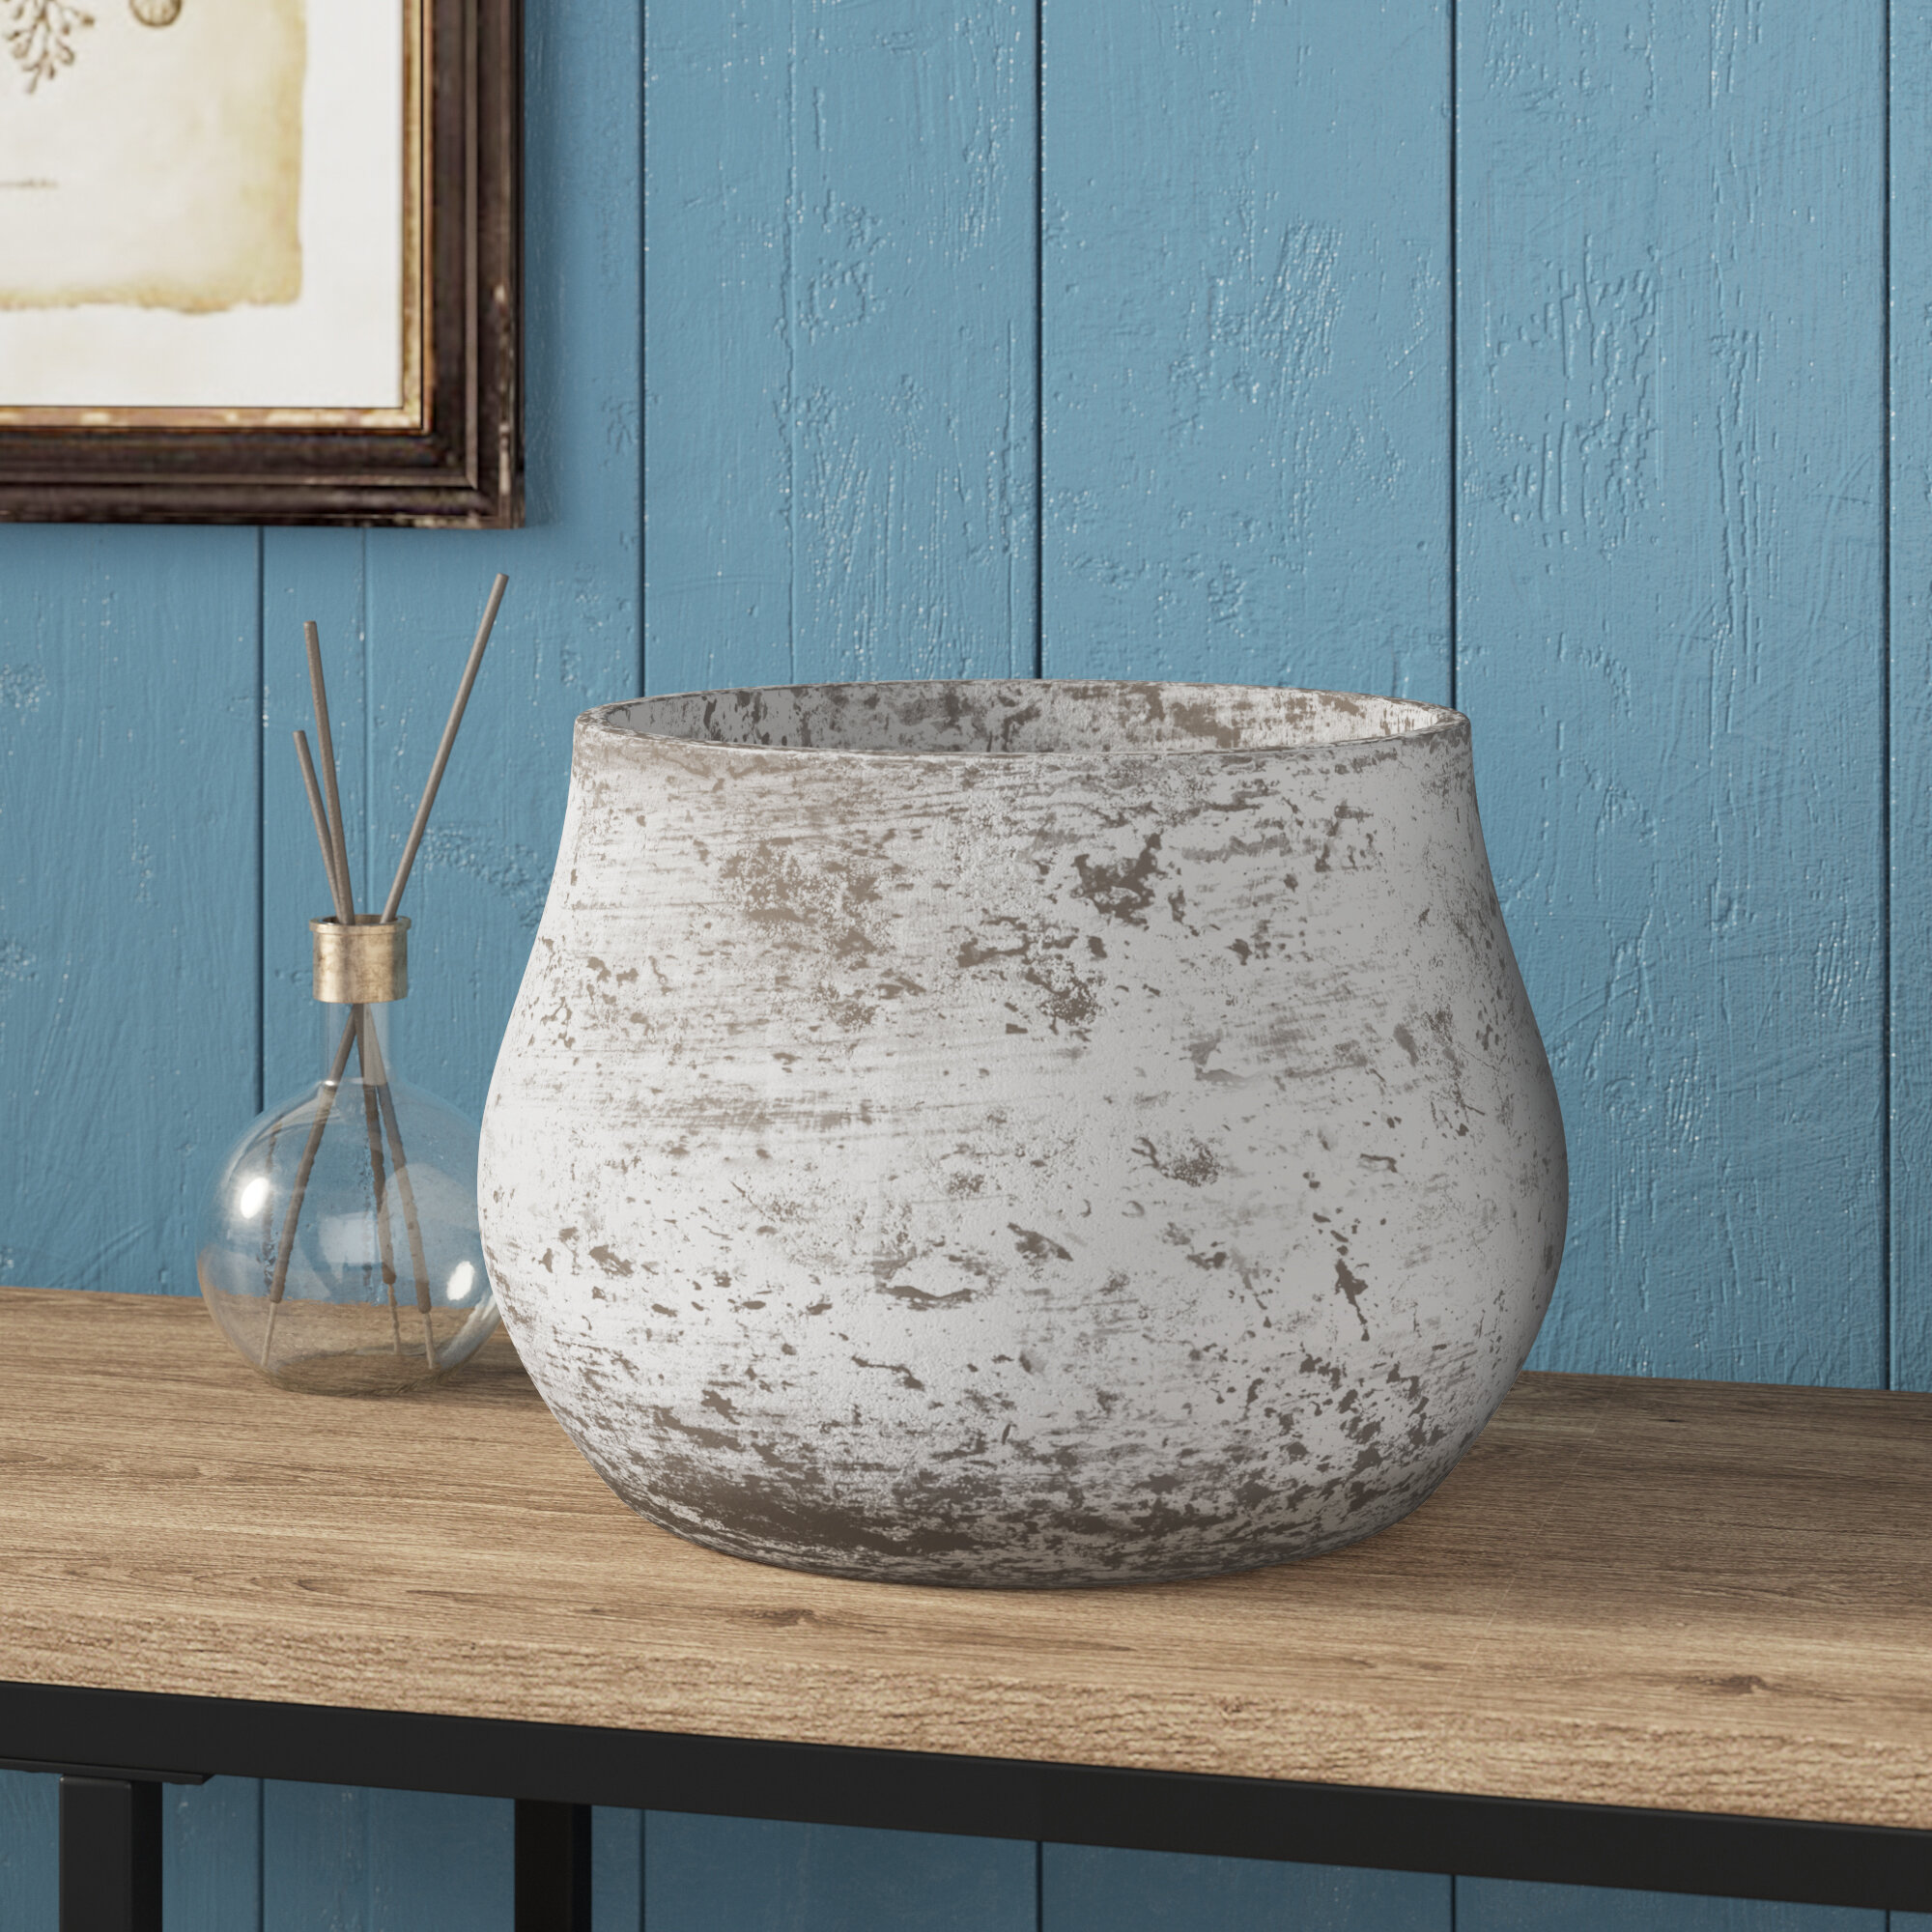 Chesterfield Maison Du Monde lark manor decorative objects you'll love in 2020 | wayfair